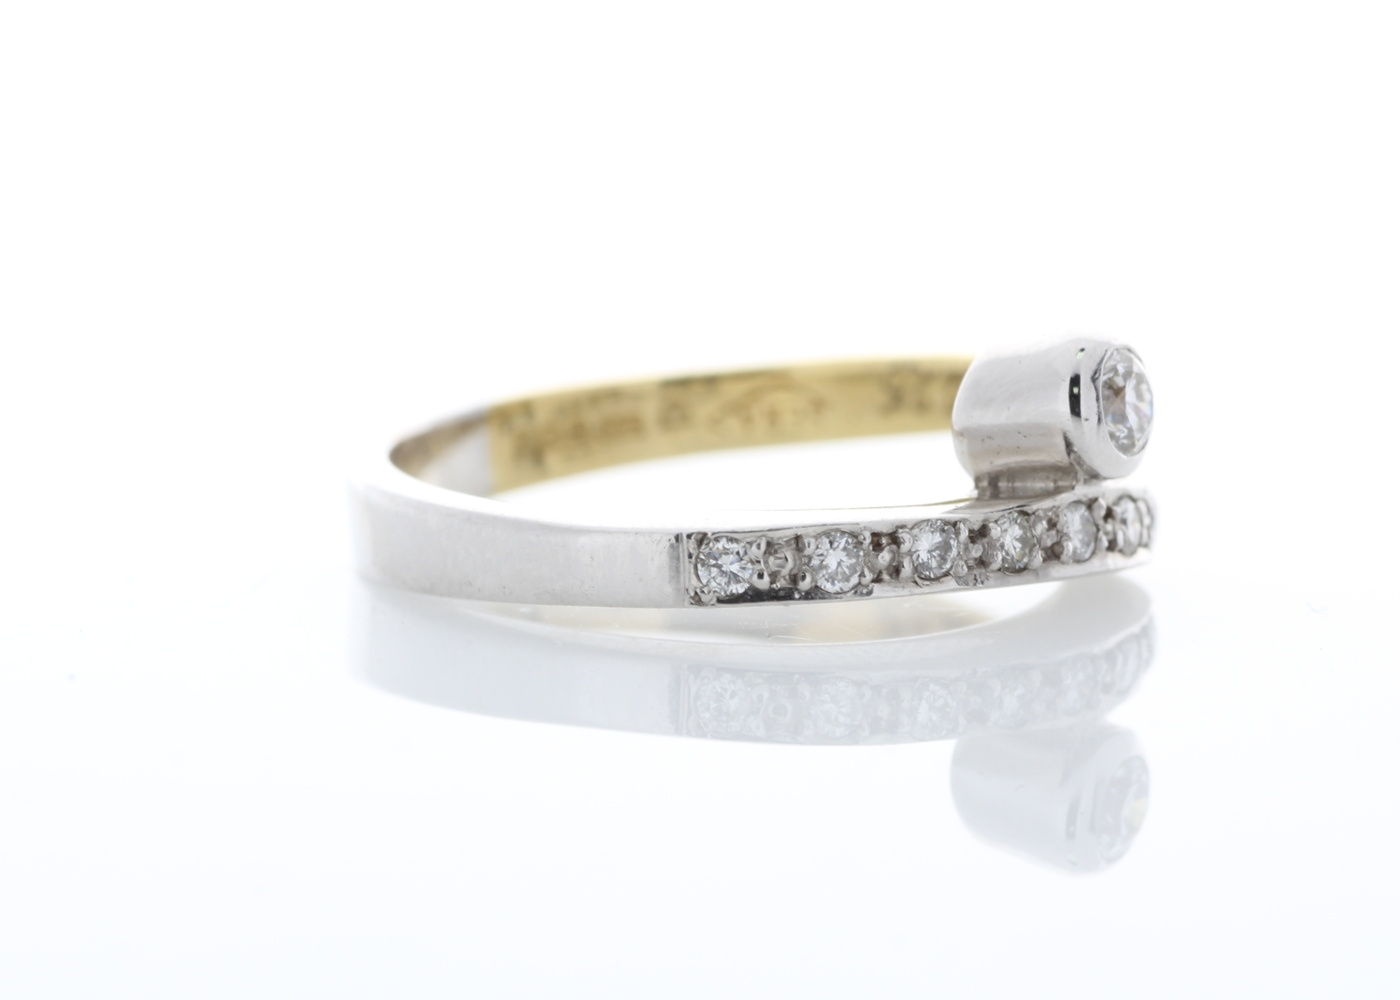 18ct Stone Set Shoulders Diamond Ring 0.11 Carats - Image 4 of 5